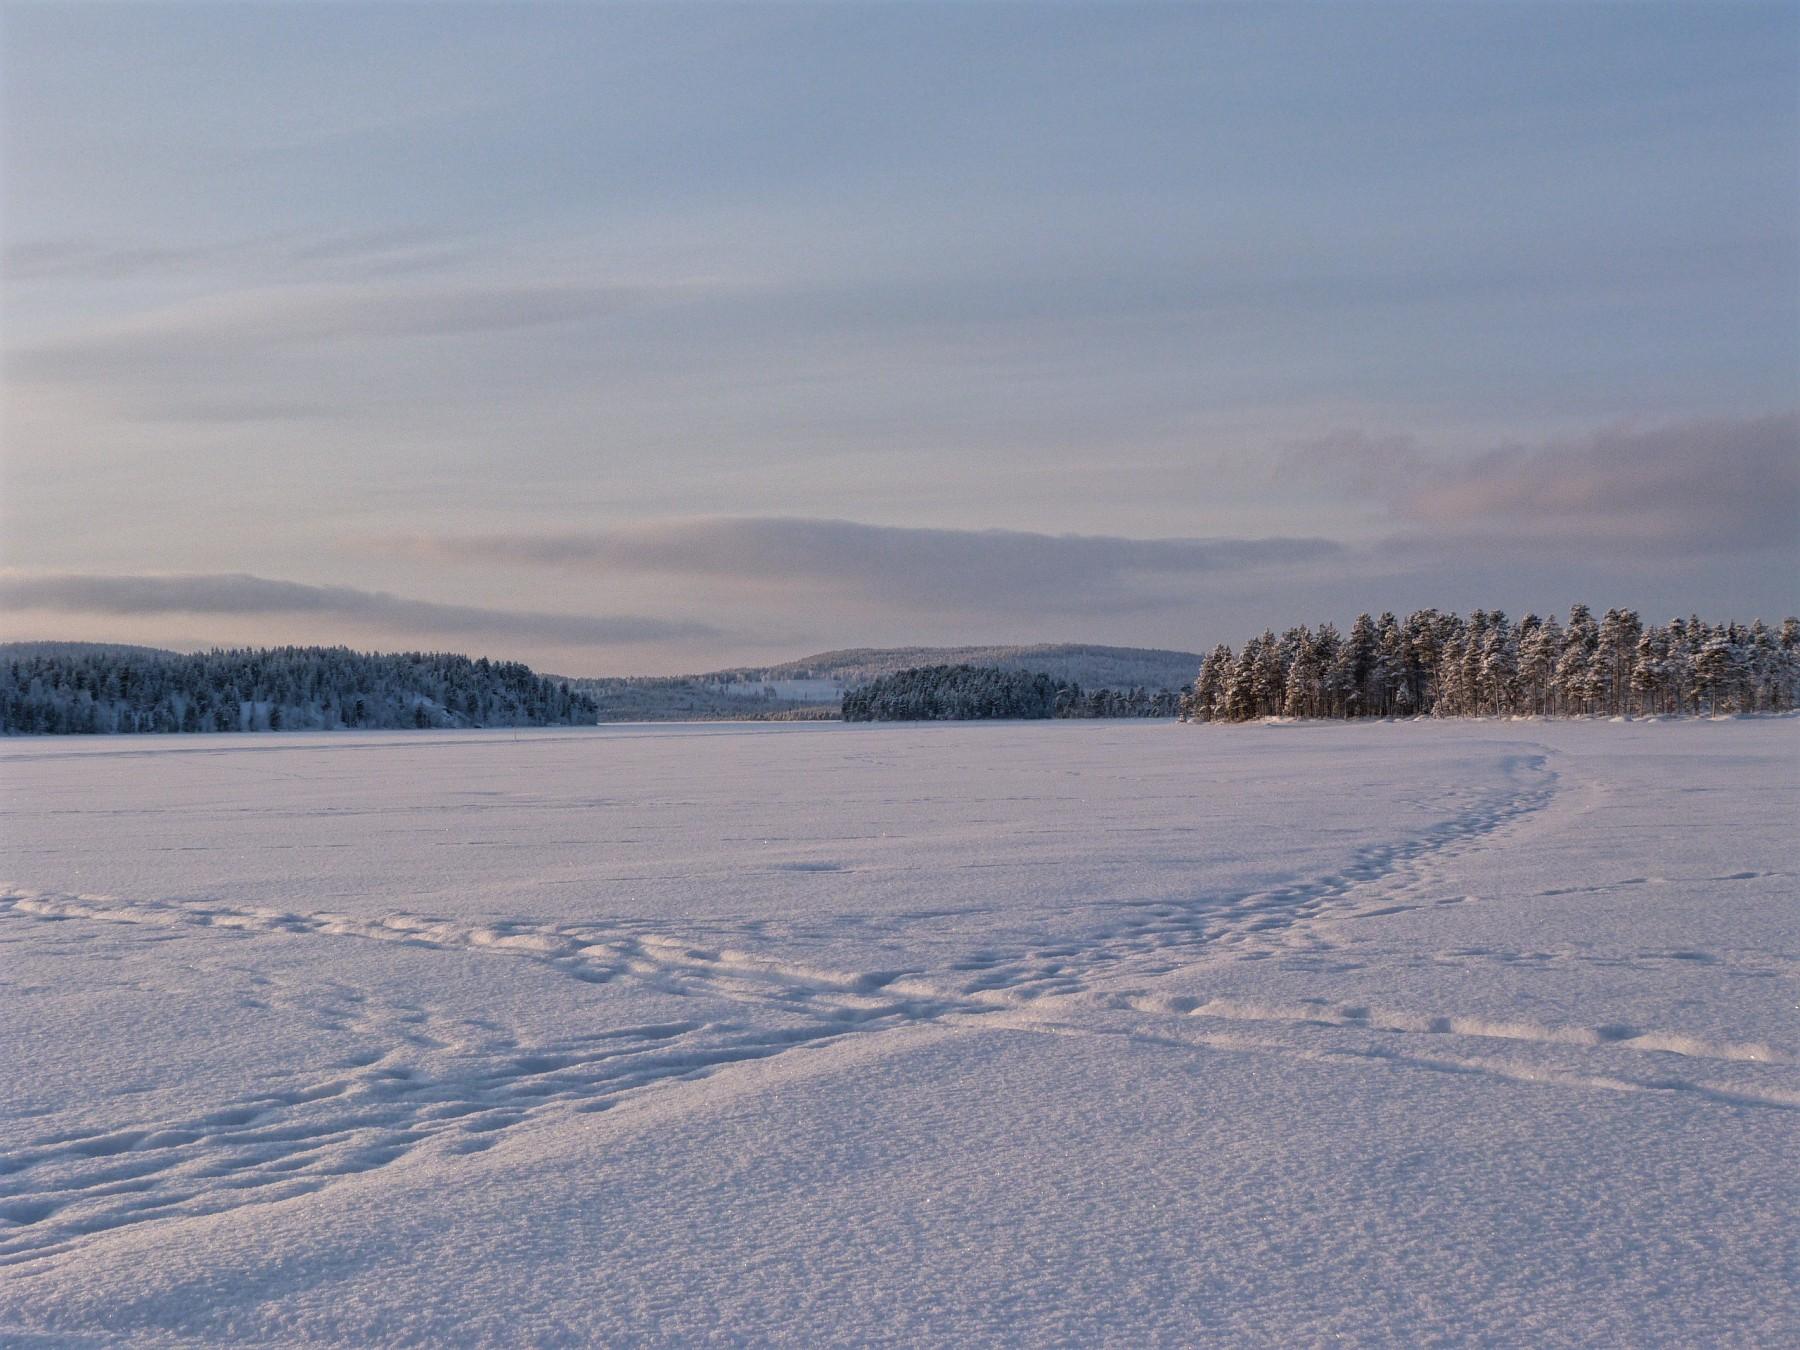 JokkmokkArcticDream-Winter-LakeSkabram